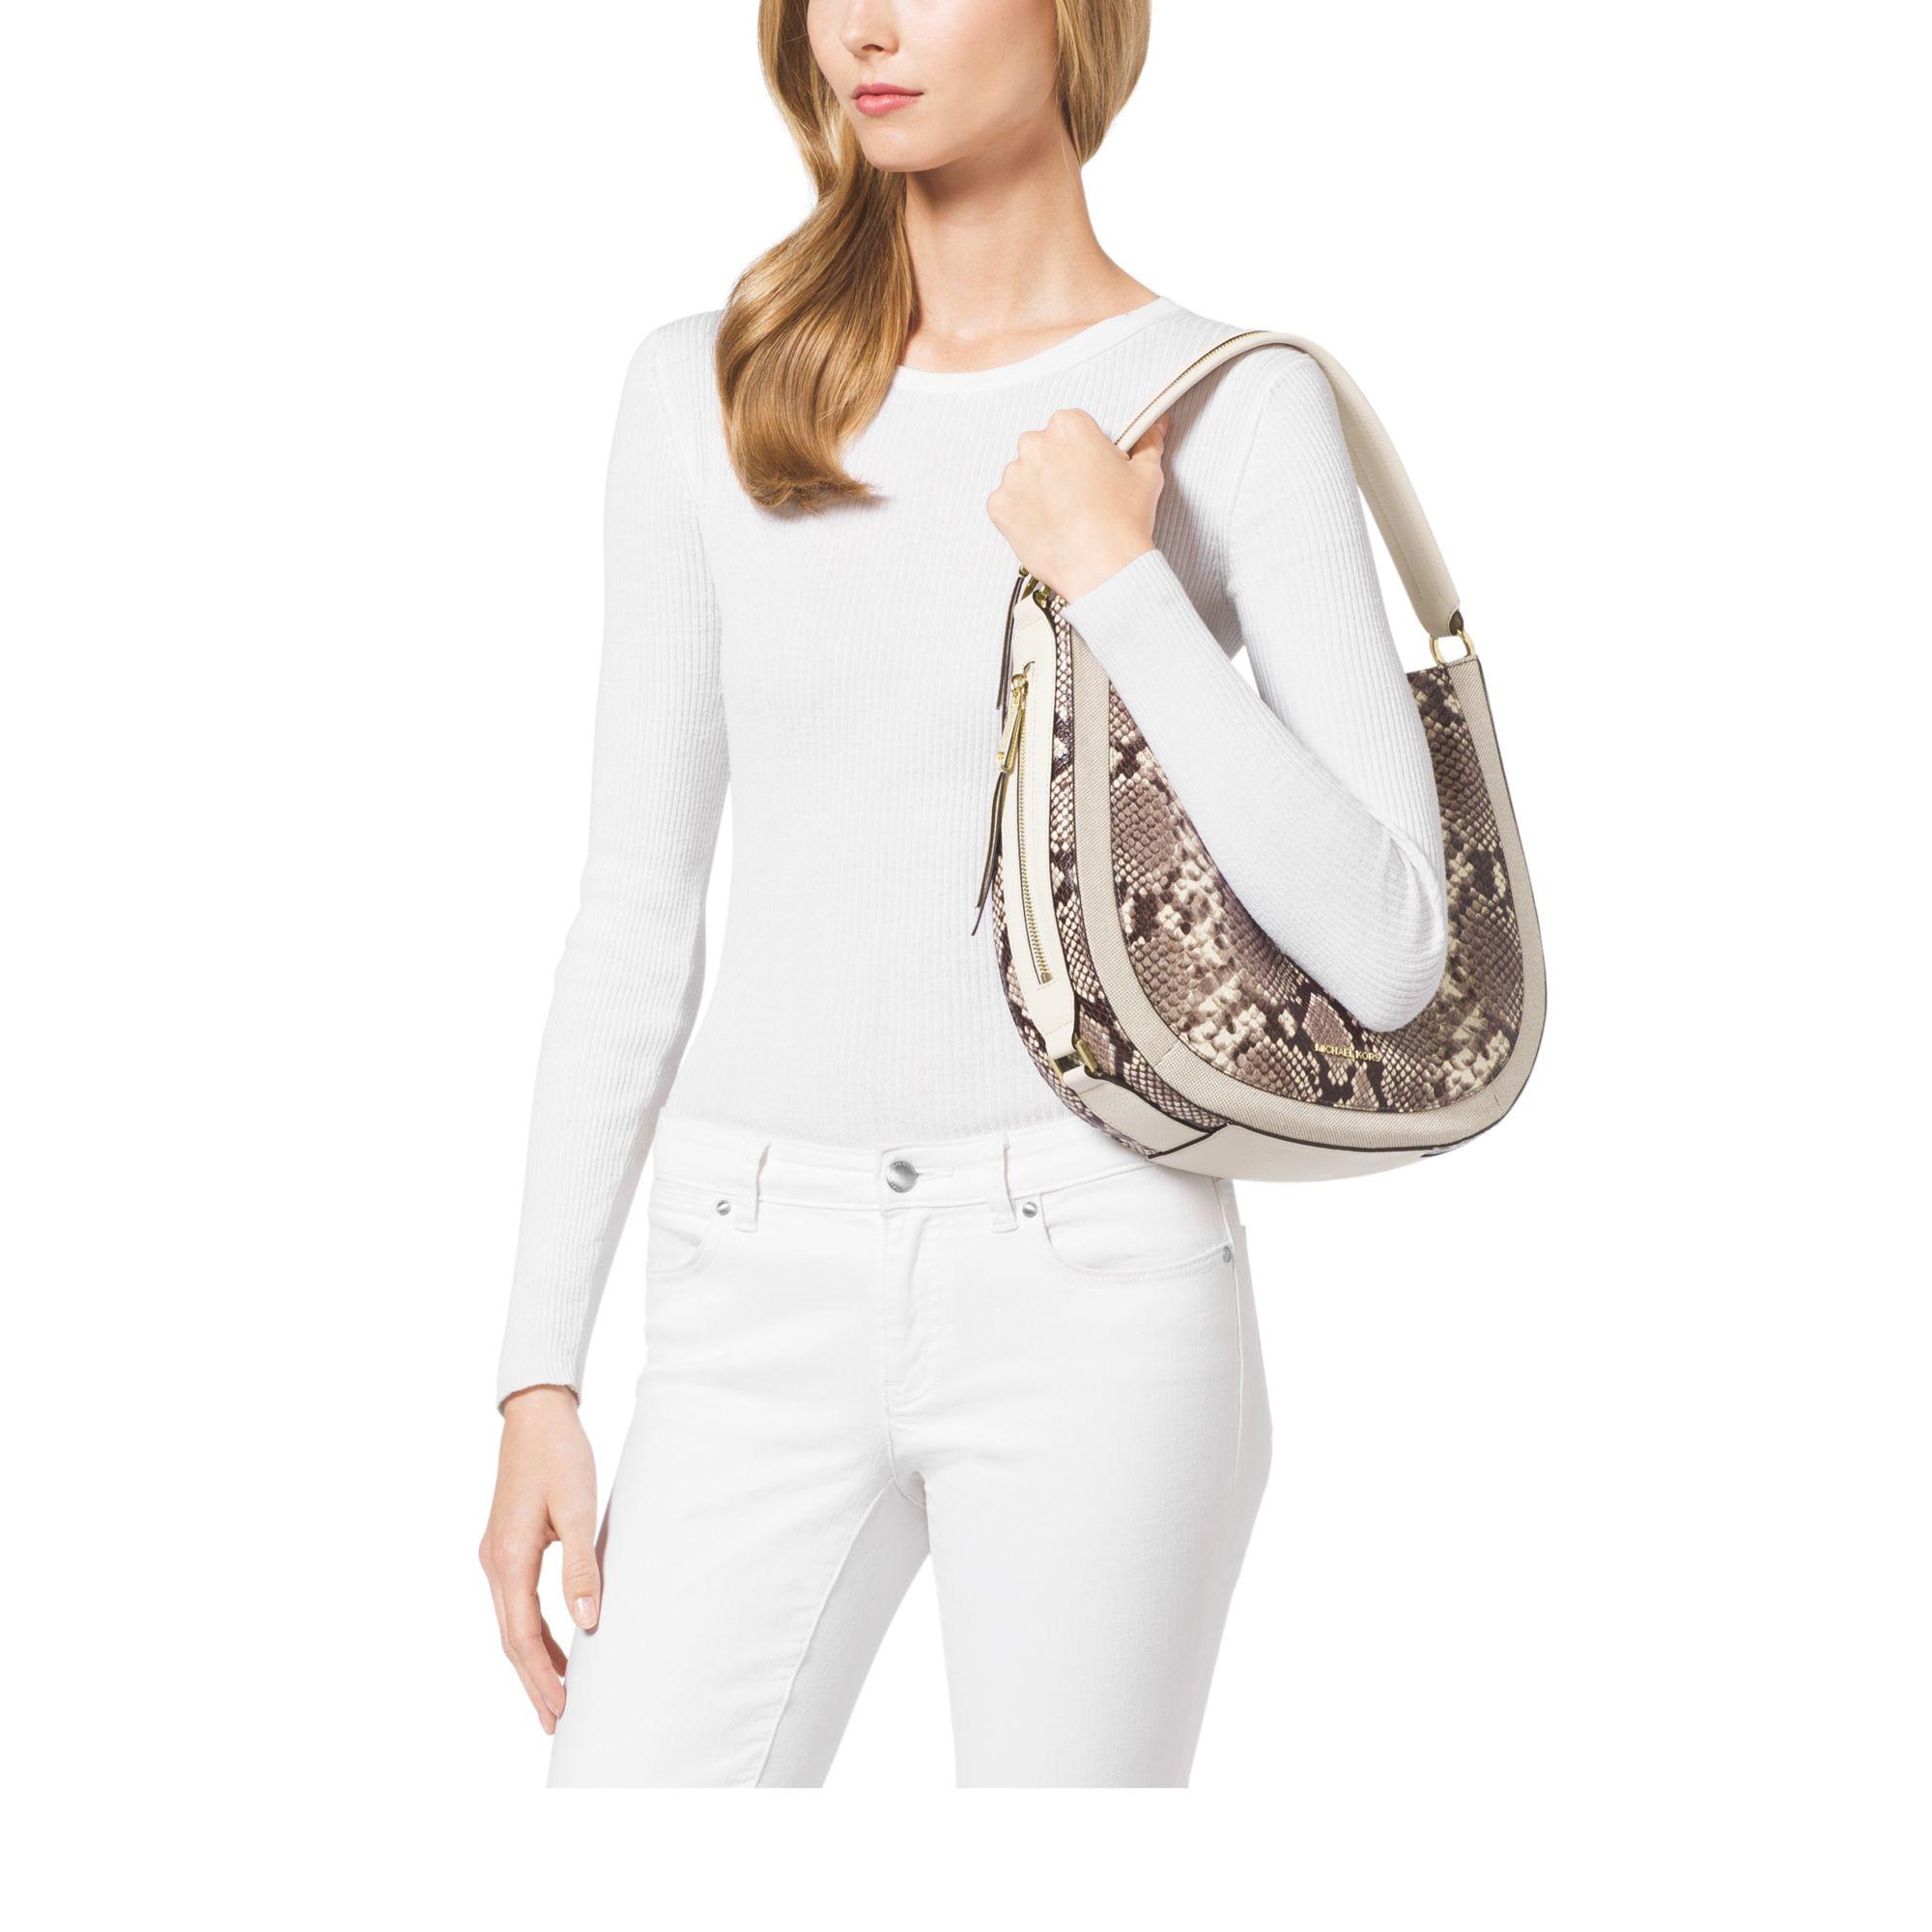 602958d4fe15e1 Michael Kors Julia Medium Embossed-leather Shoulder Bag - Lyst